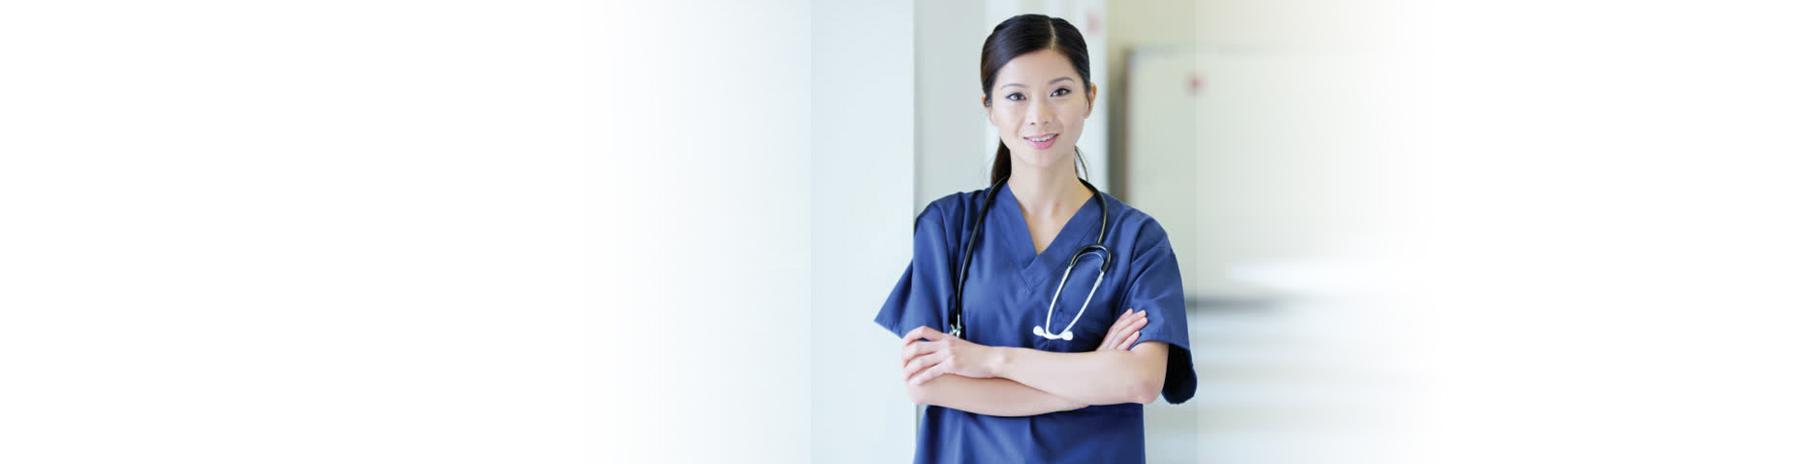 Asian Nurse Leaning